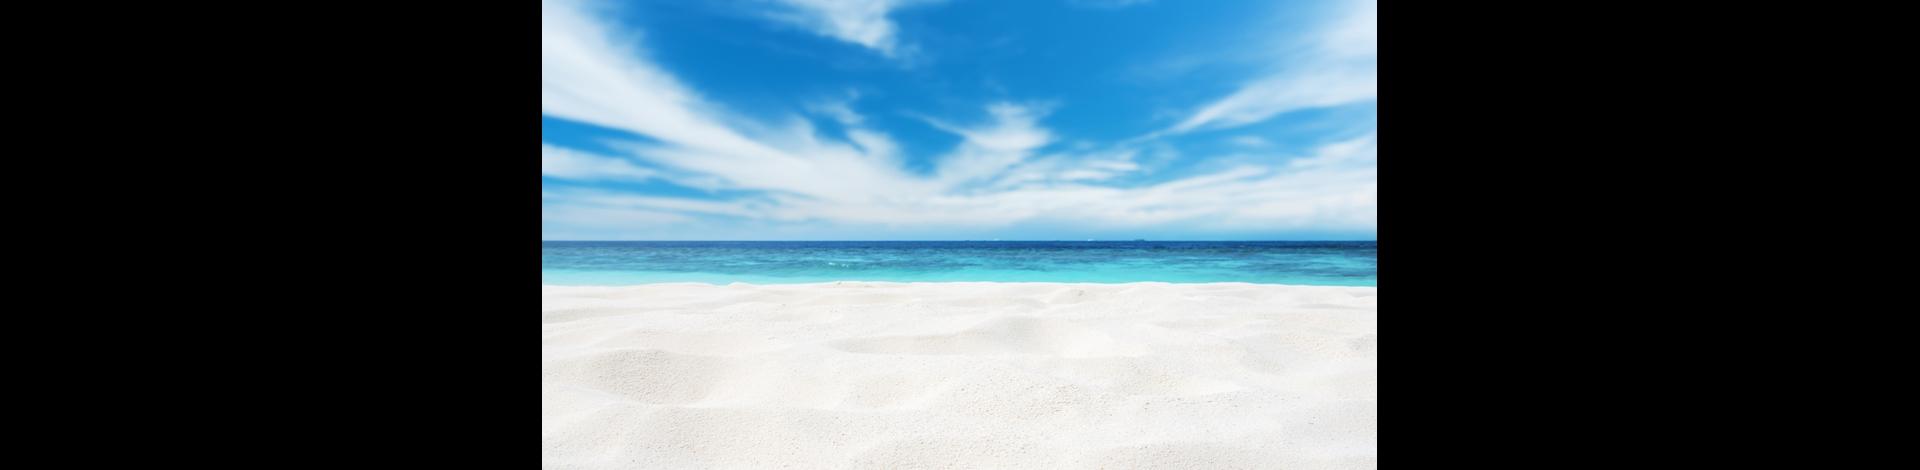 Mueang Pathum Thani